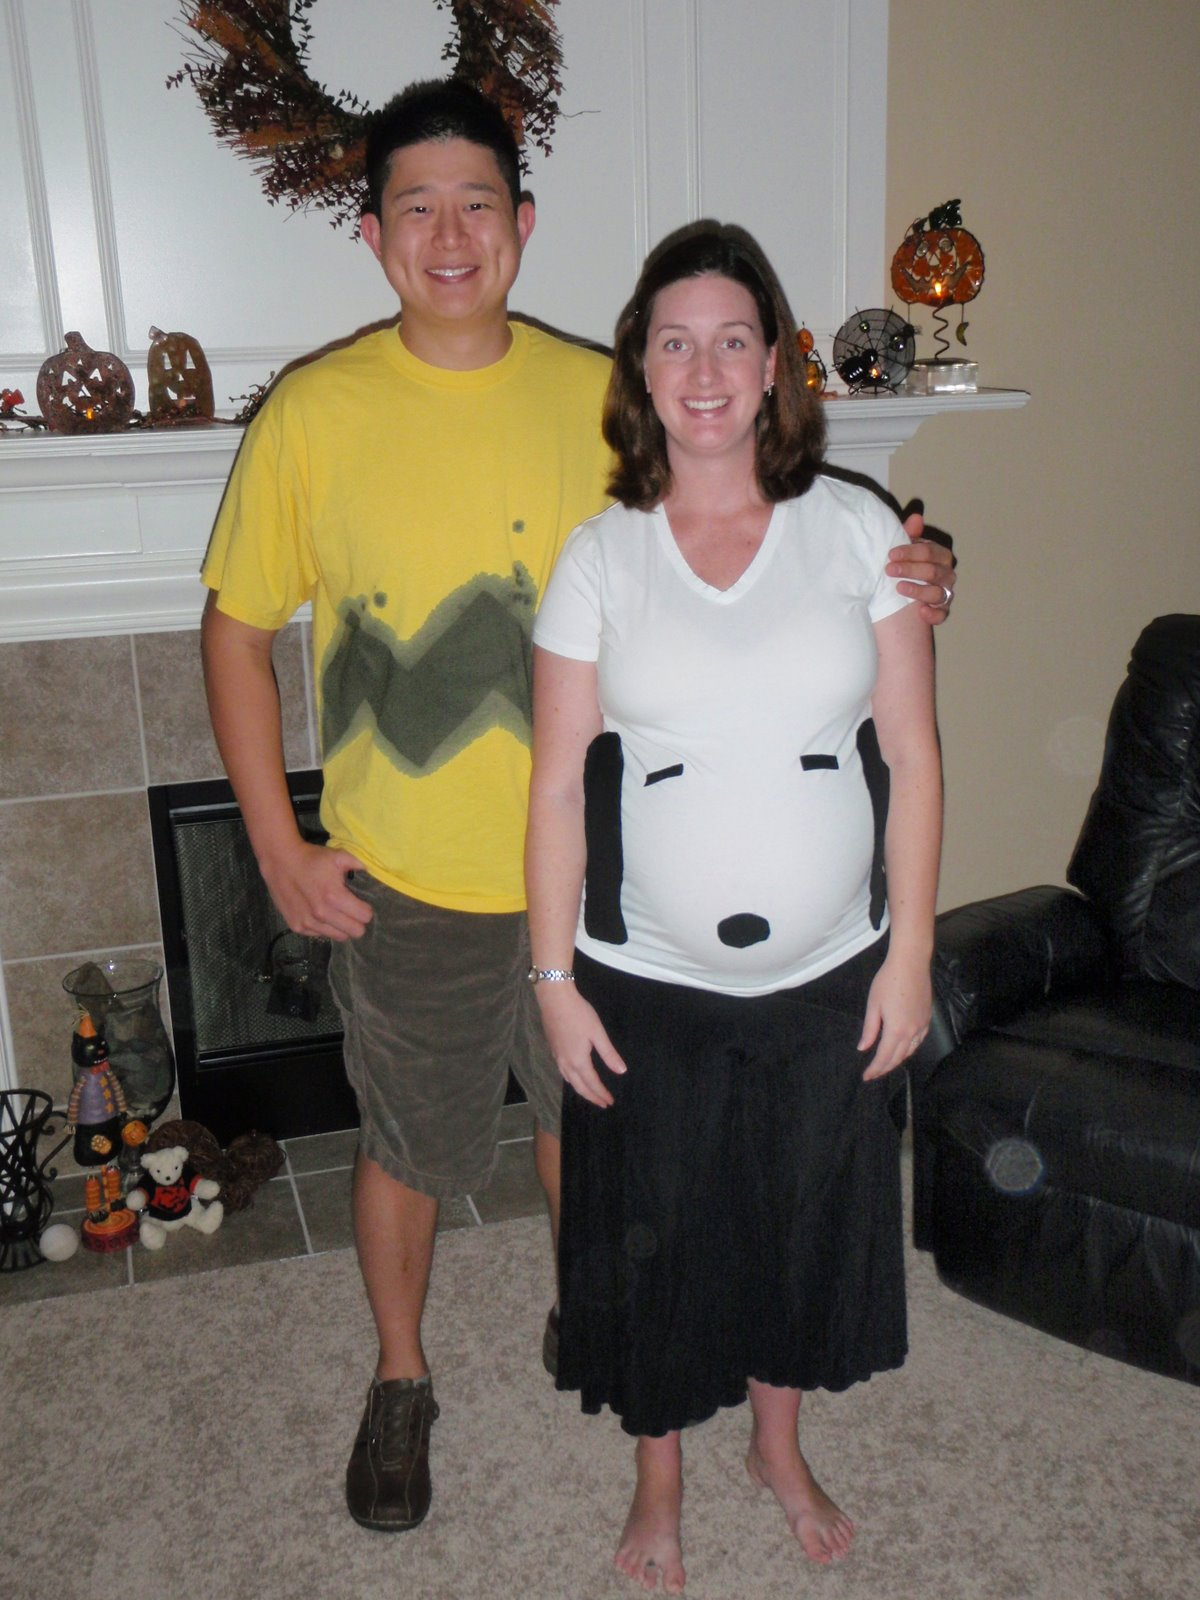 do it yourself divas: 10 greatest diy maternity halloween costume ideas